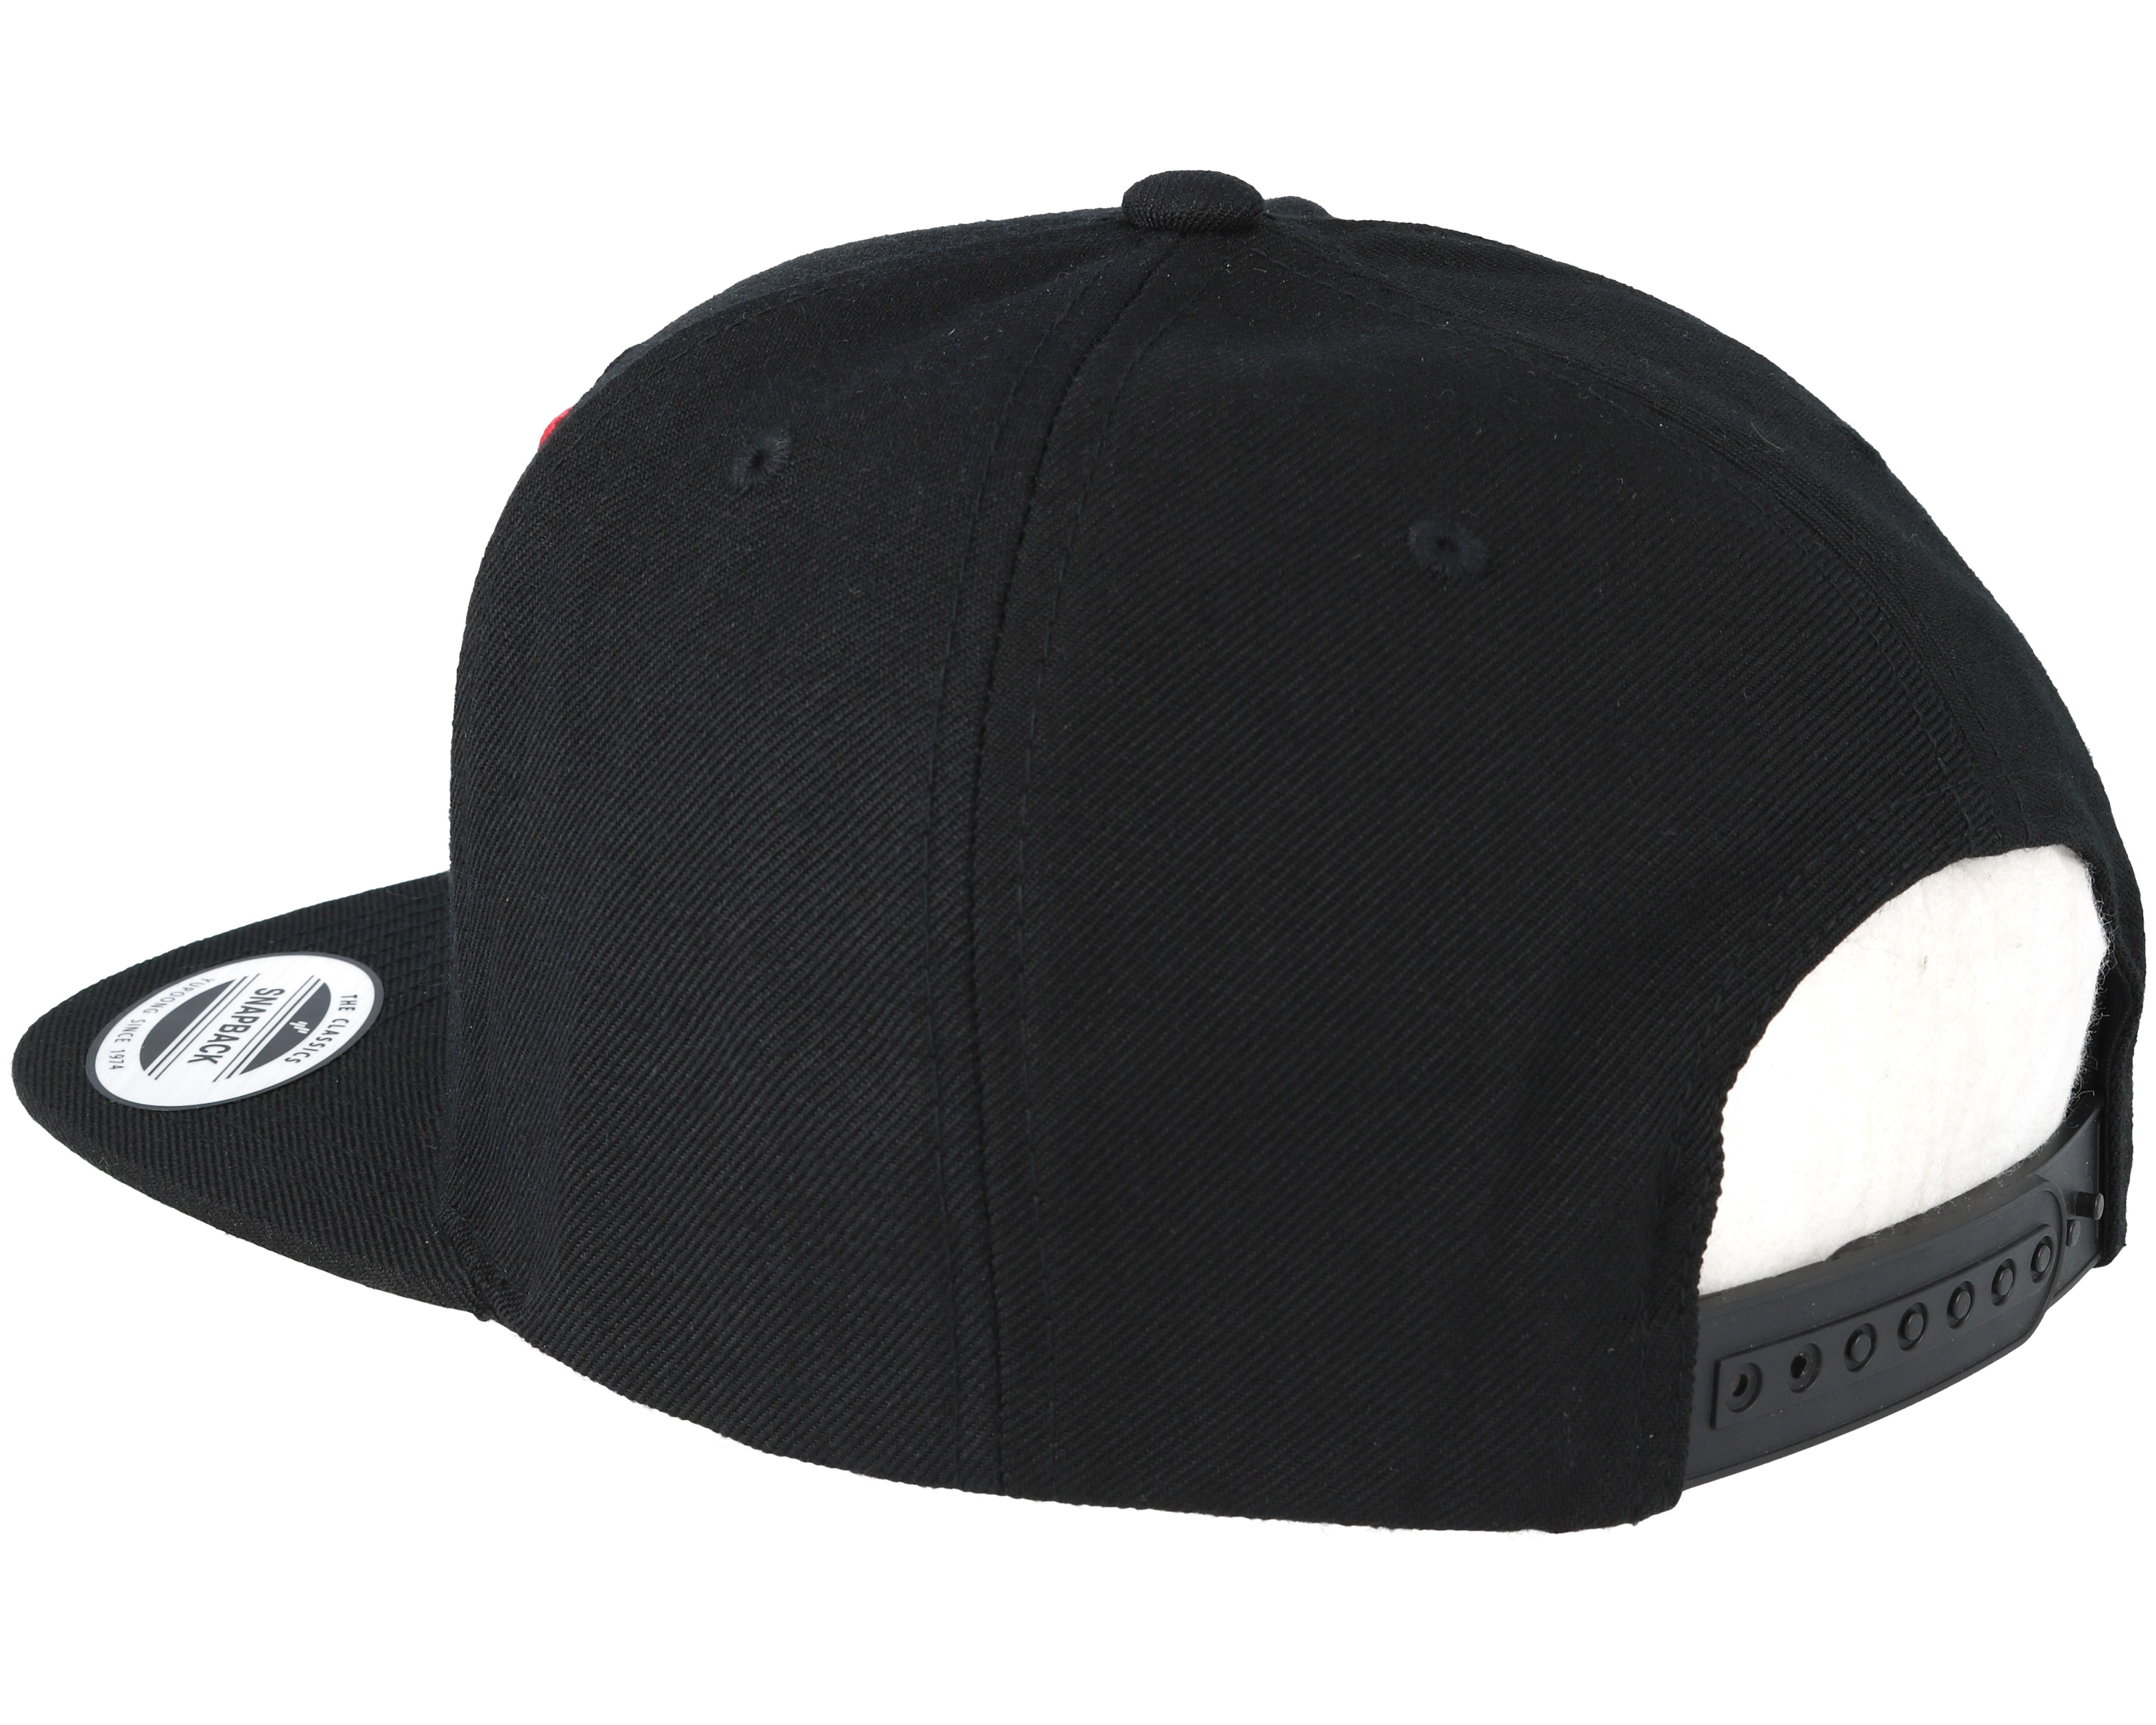 Run Dmc Logo Black Snapback Mister Tee Caps Hatstore Co Uk